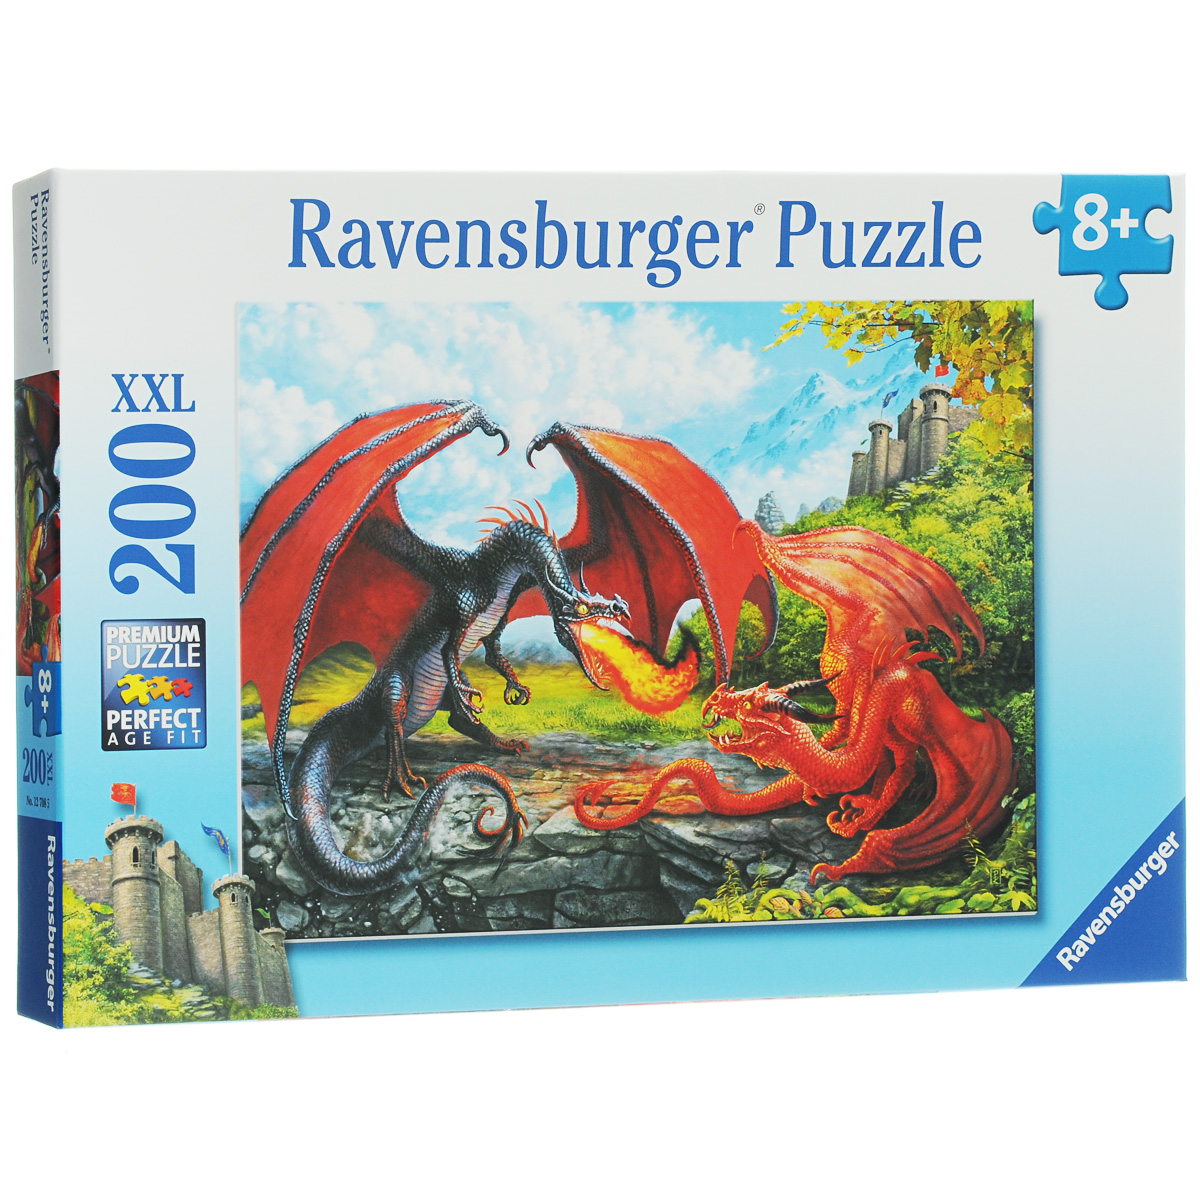 Ravensburger Битва драконов. Пазл XXL, 200 элементов